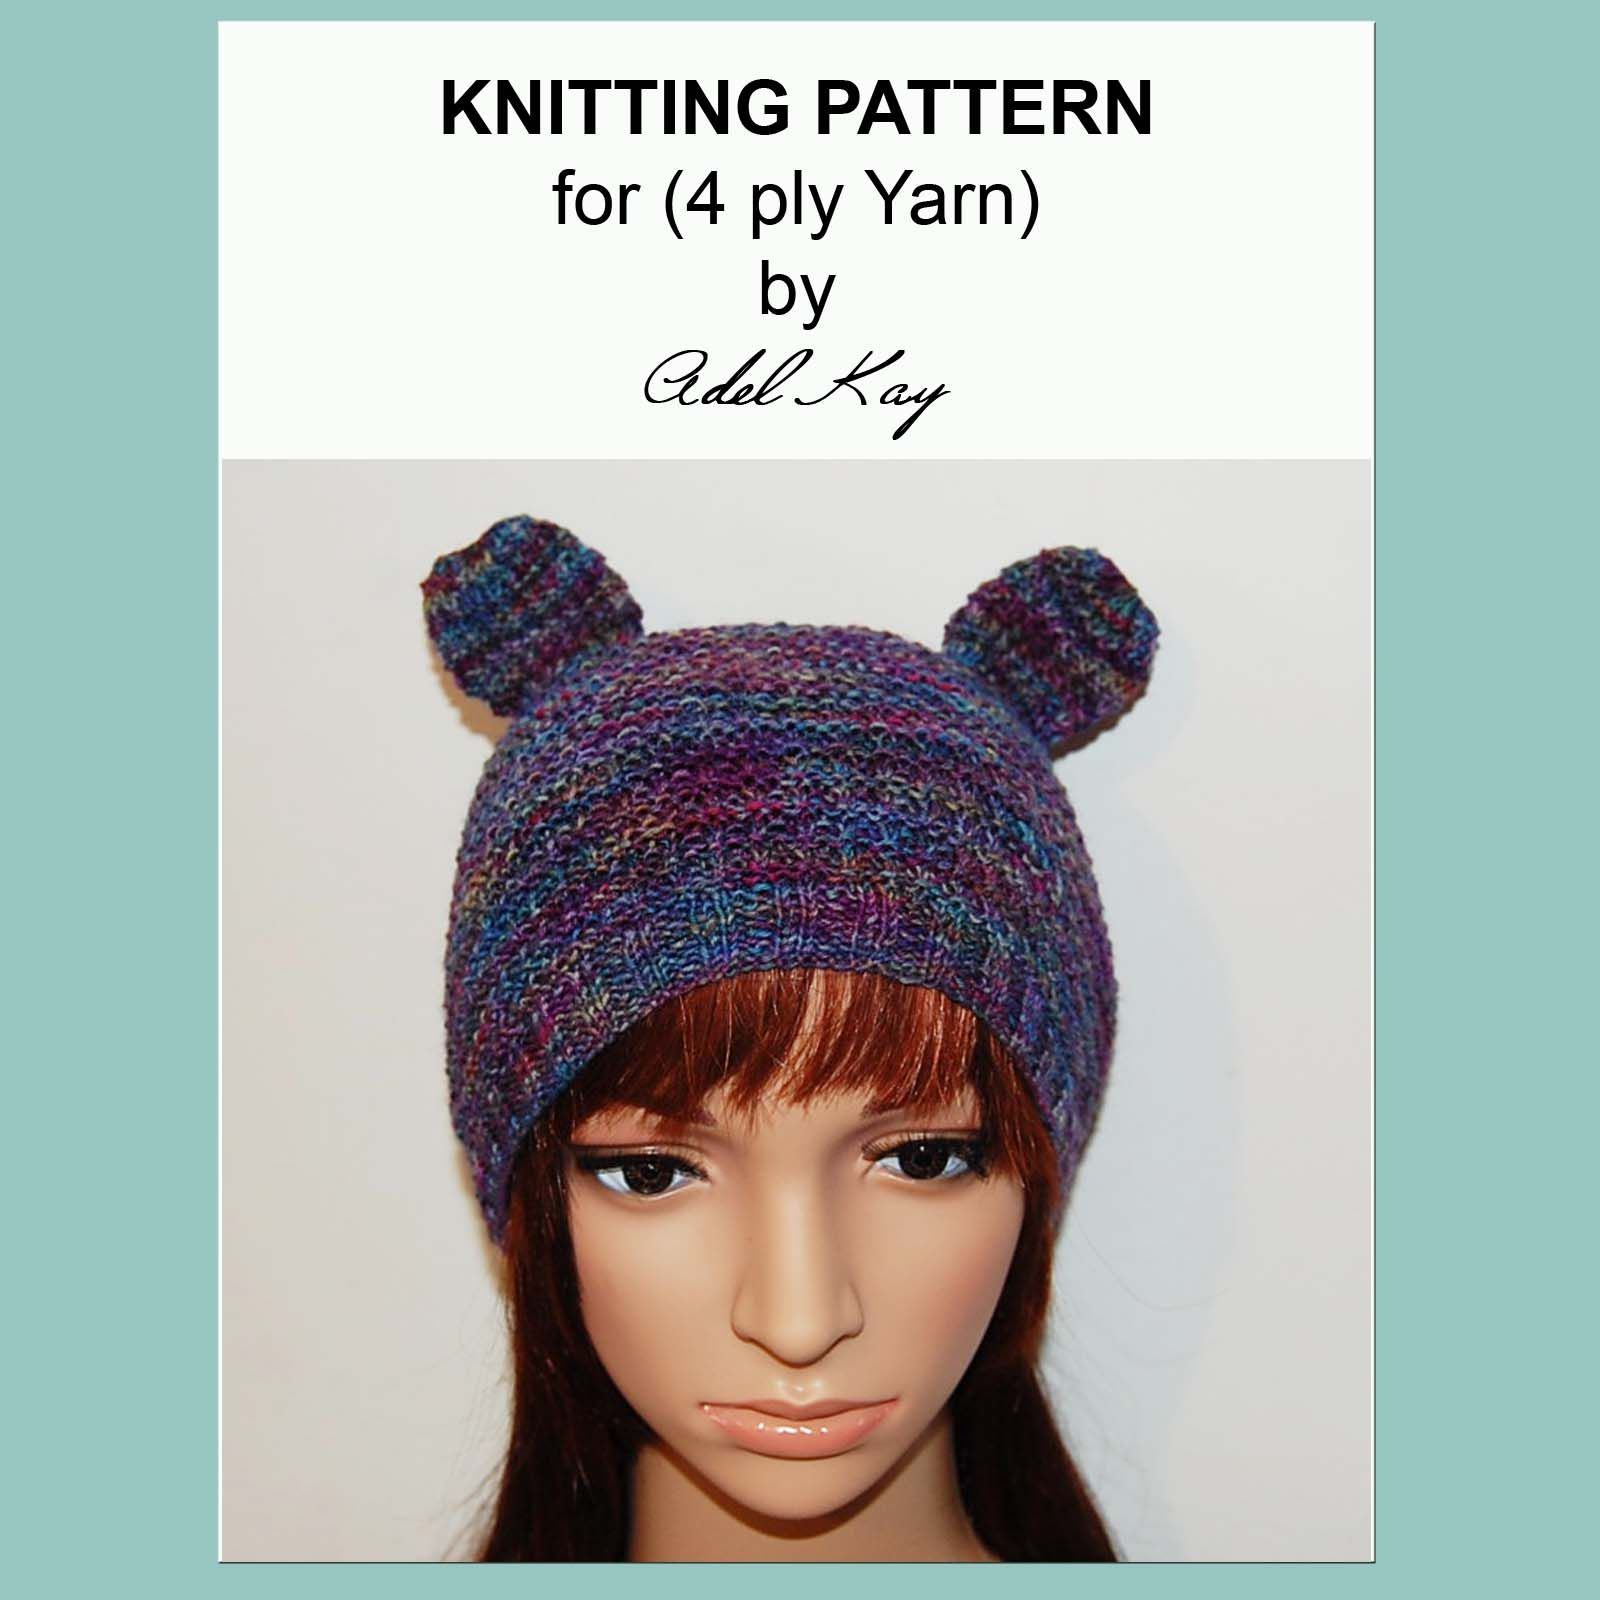 Aimee bear hat knitting pattern my knitting pattern designs aimee bear hat knitting pattern bankloansurffo Gallery